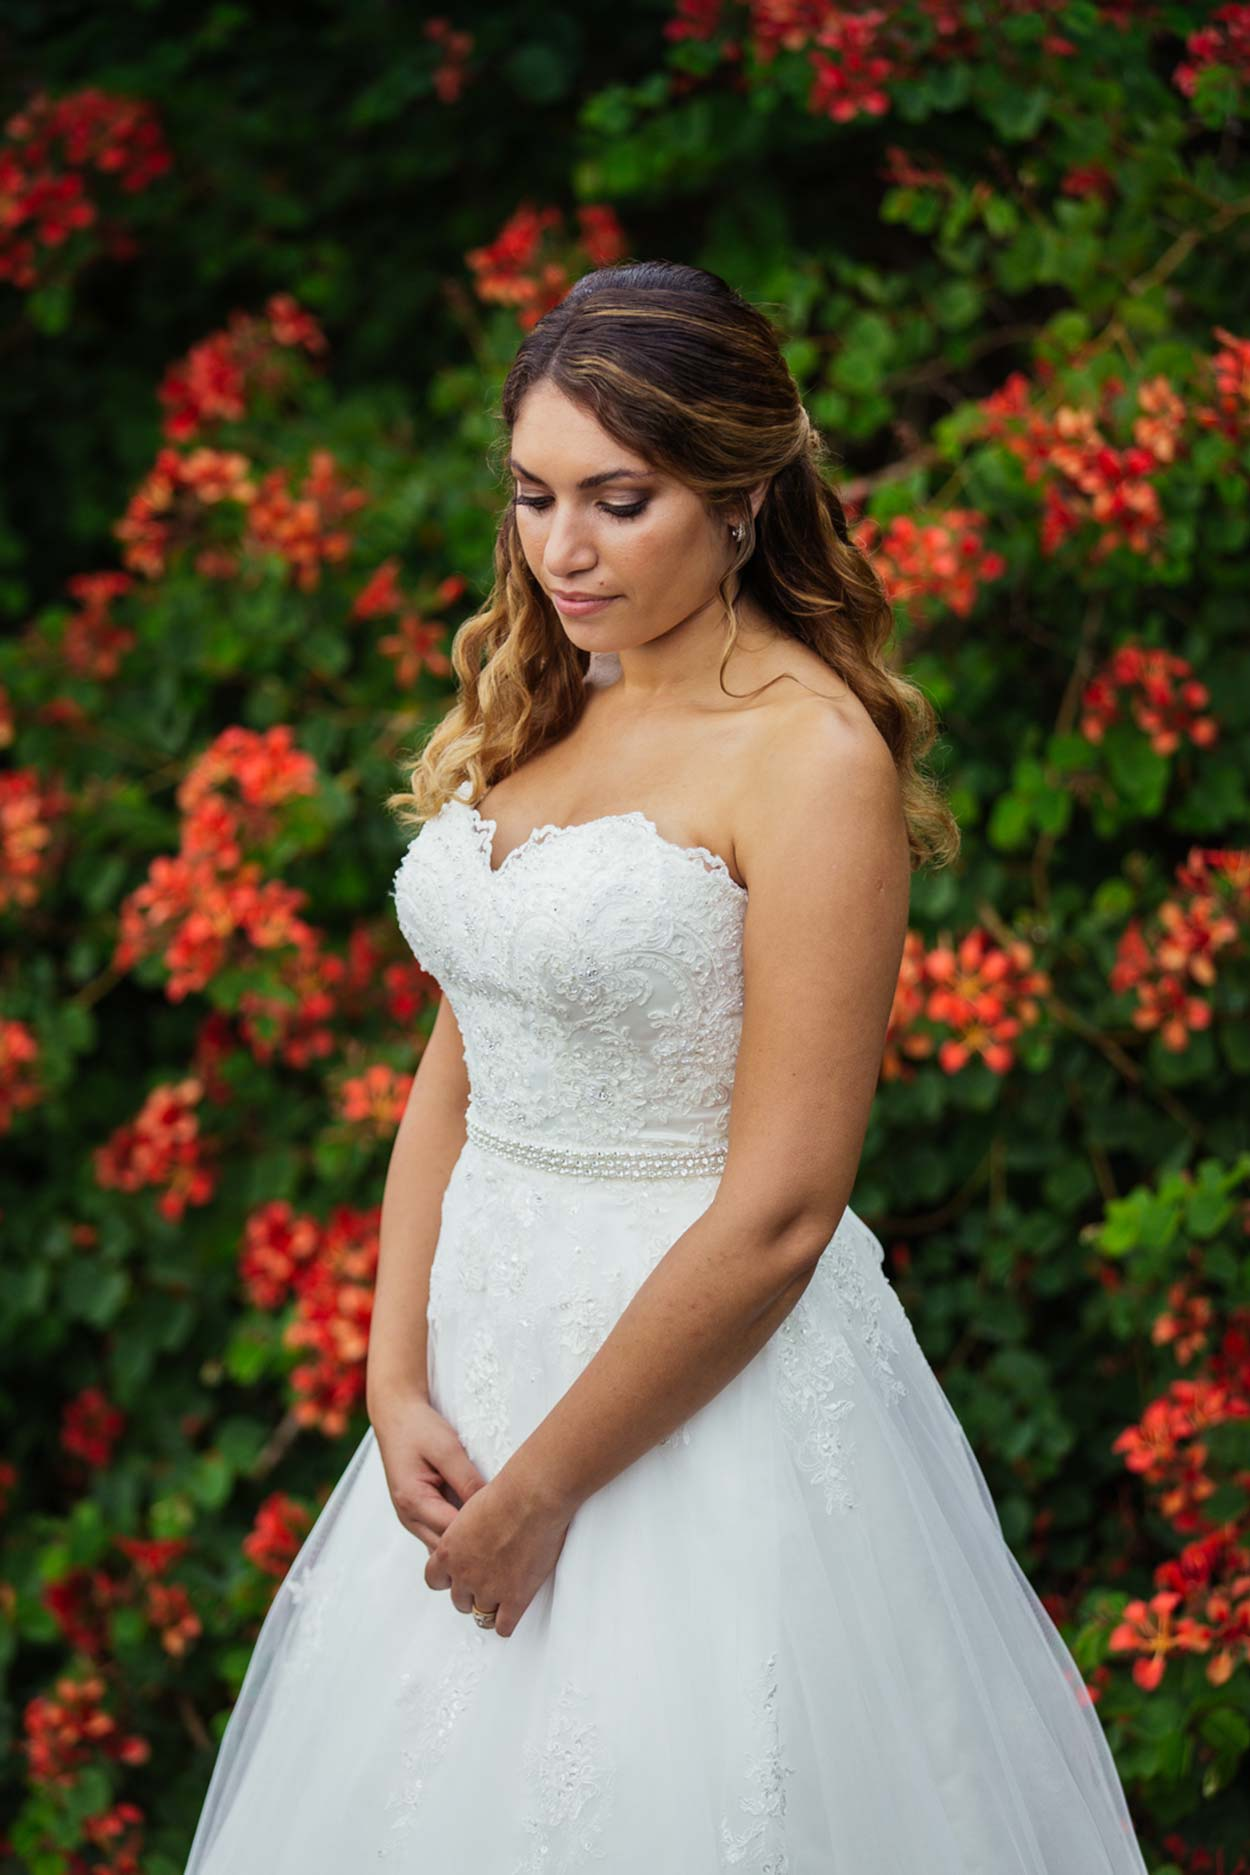 sunshine-coast-destination-wedding-photographers-brisbane-queensland-australian-maleny-noosa-beach-hinterland-montville-flaxton-gold-caloundra-elopement-photos-best-recommended-eco-friendly-packages-98.jpg